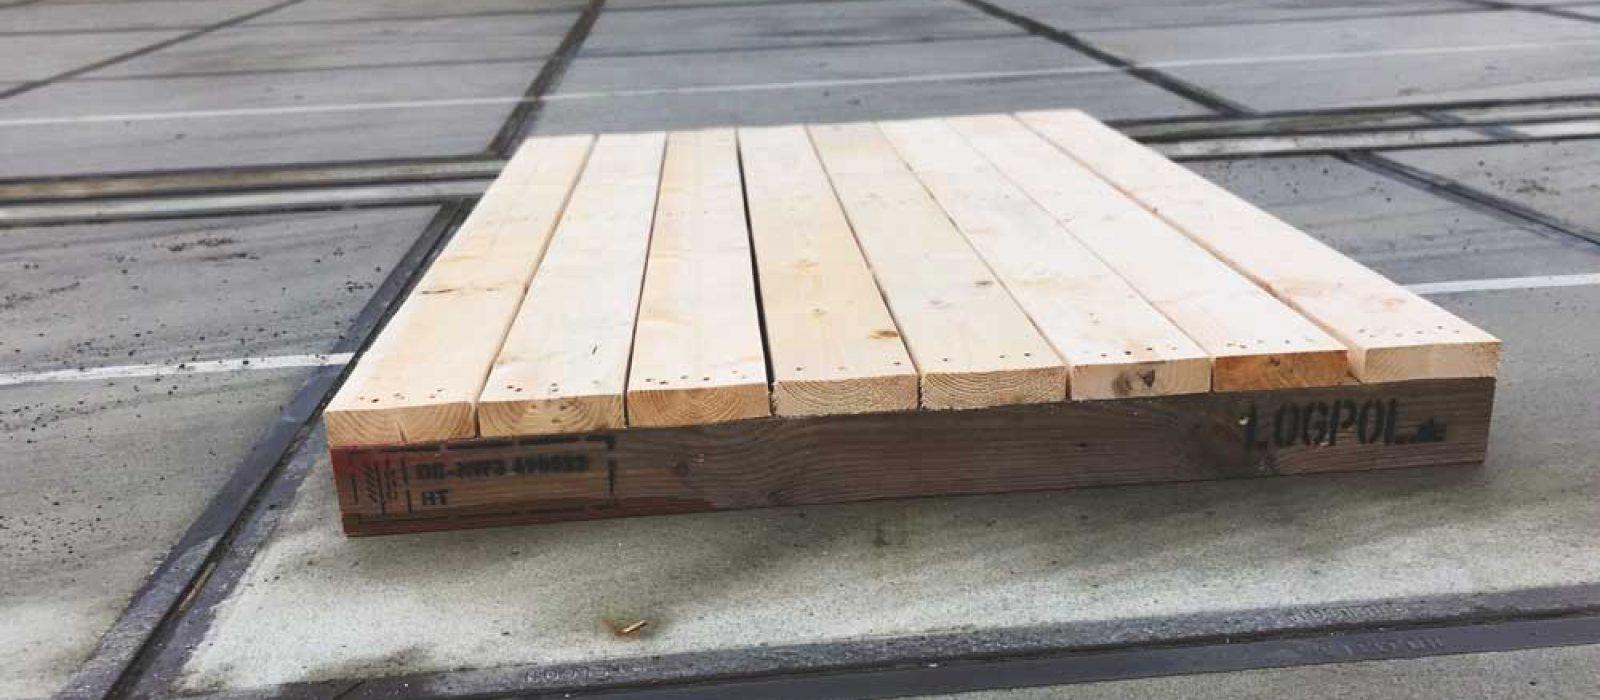 Holzpalette-1600x1200_LOGPOL